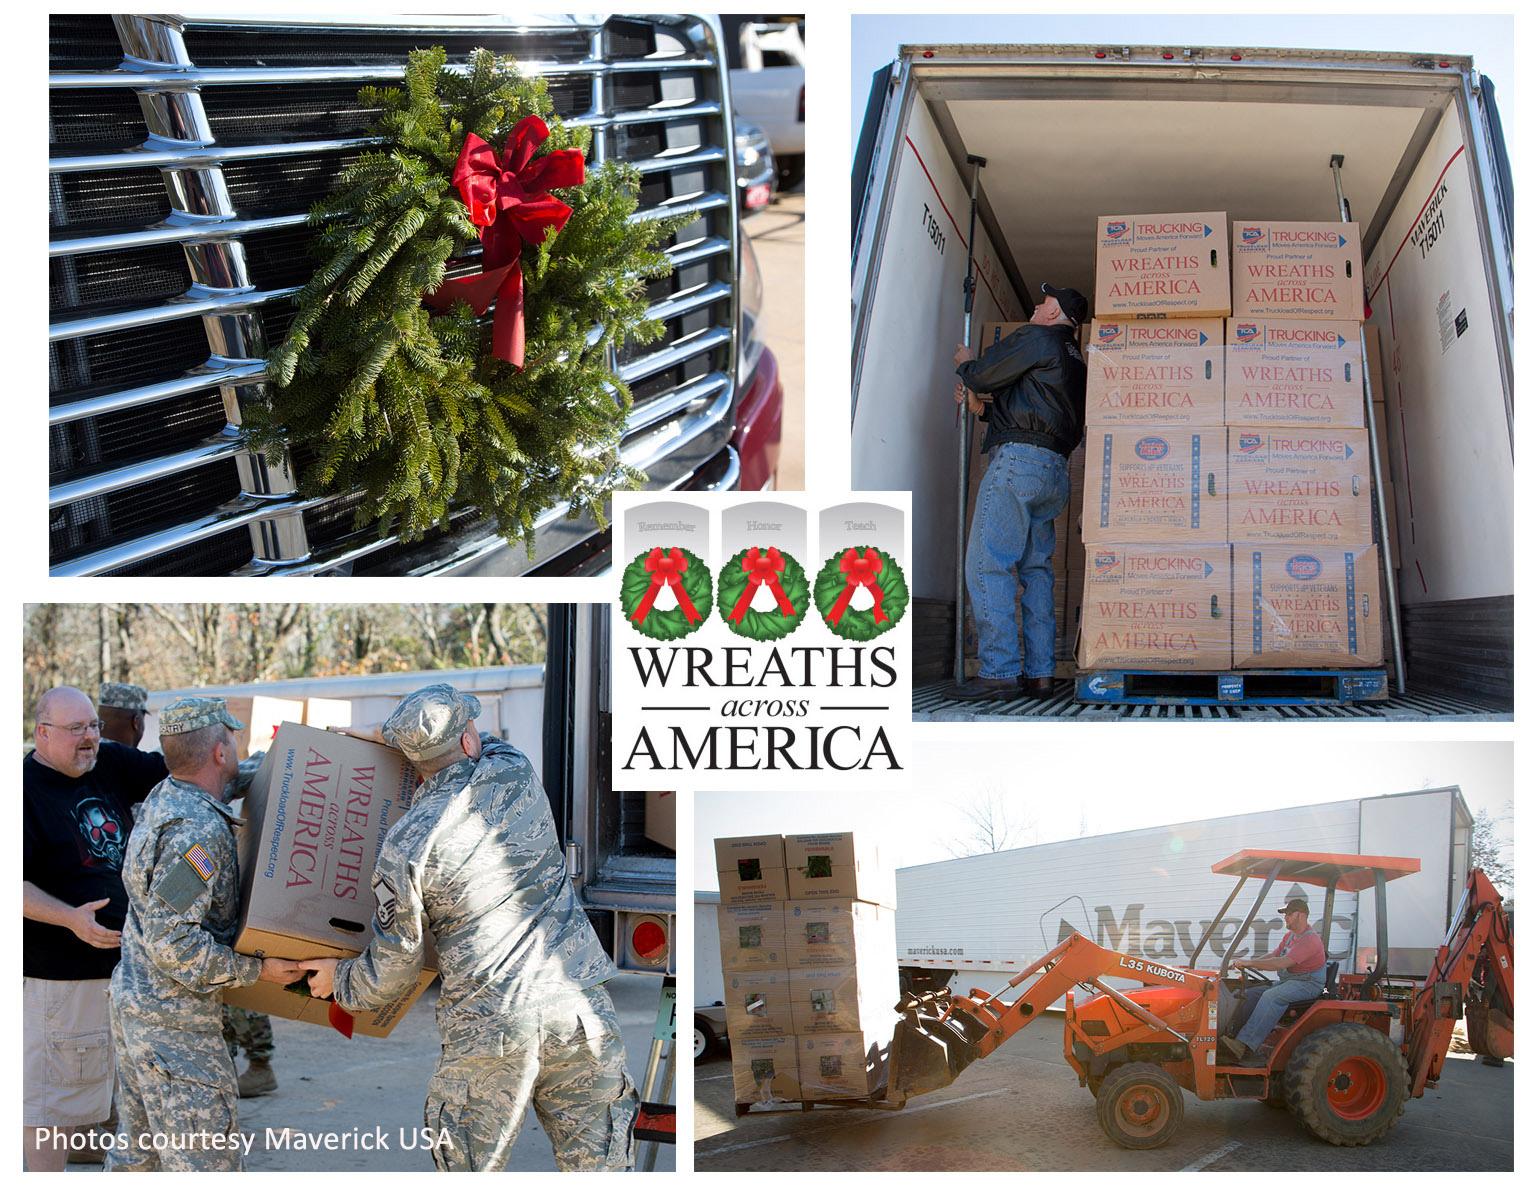 Trucking Wreaths Across America